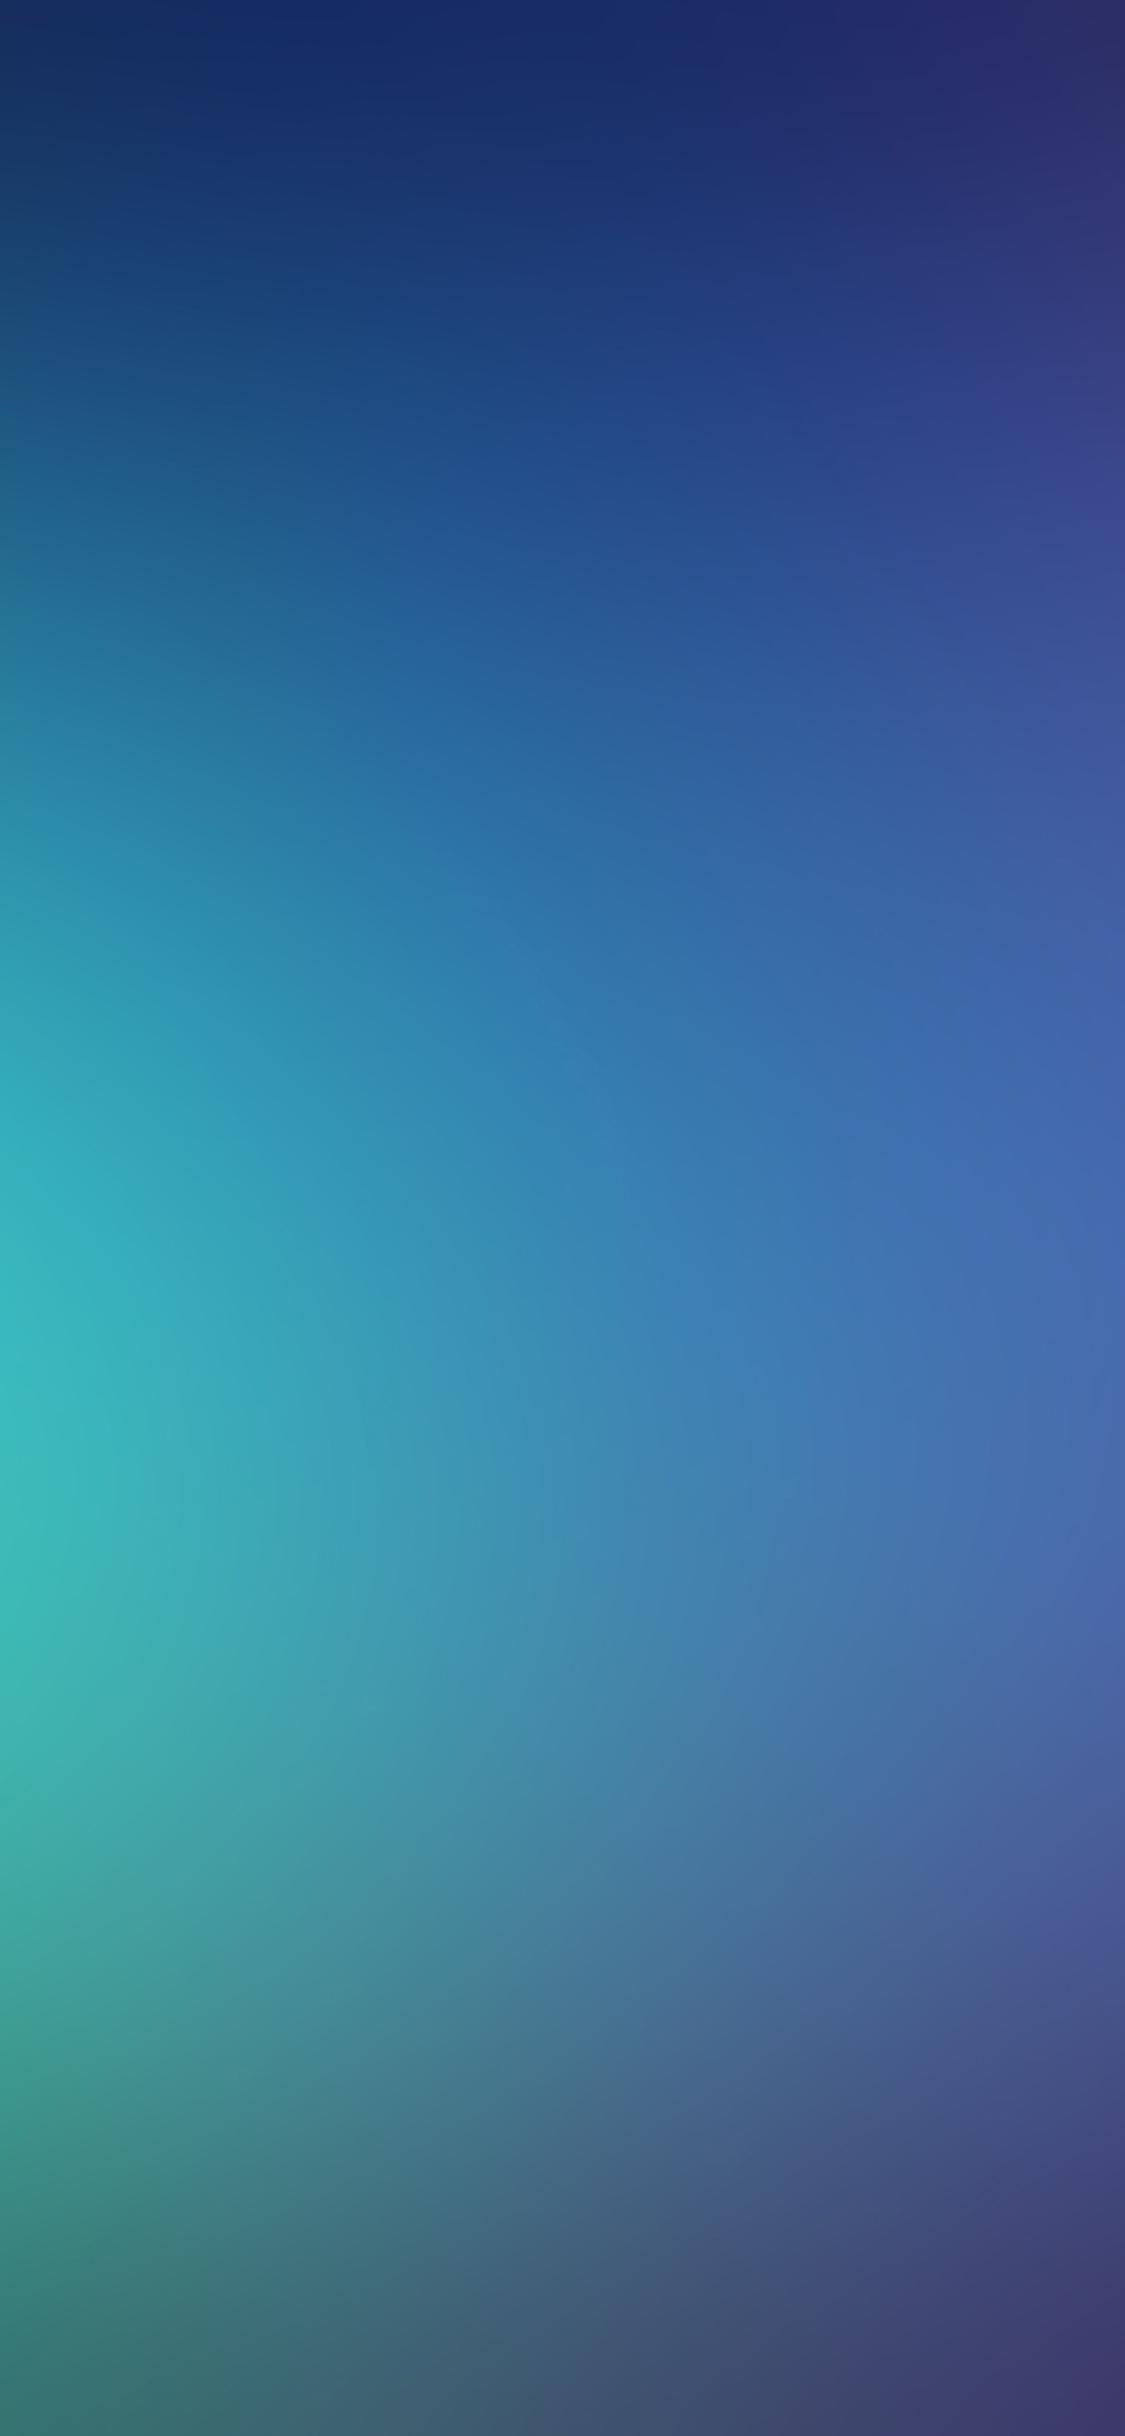 Air Anime Wallpaper Sd69 Blue Windows Green Gradation Blur Papers Co